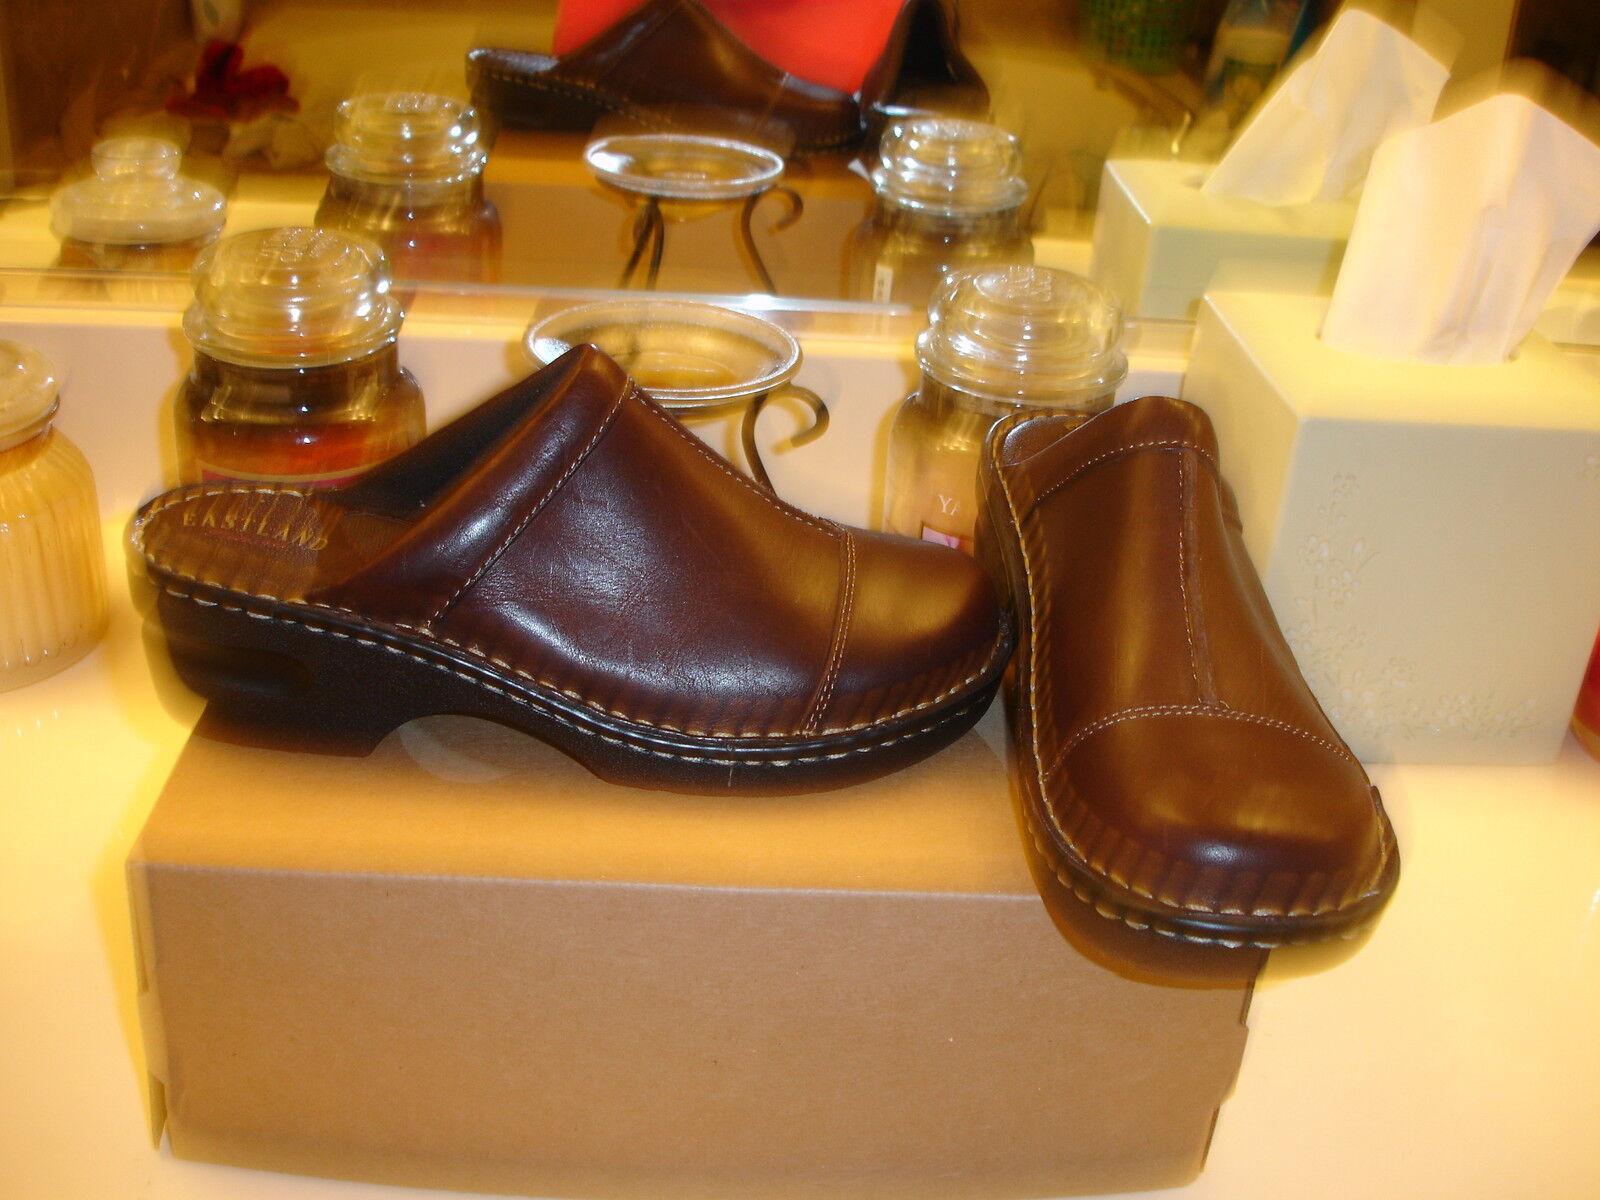 Eastland Collette Braun Leder Clog Mule Comfortable Styllish Nice 7  90